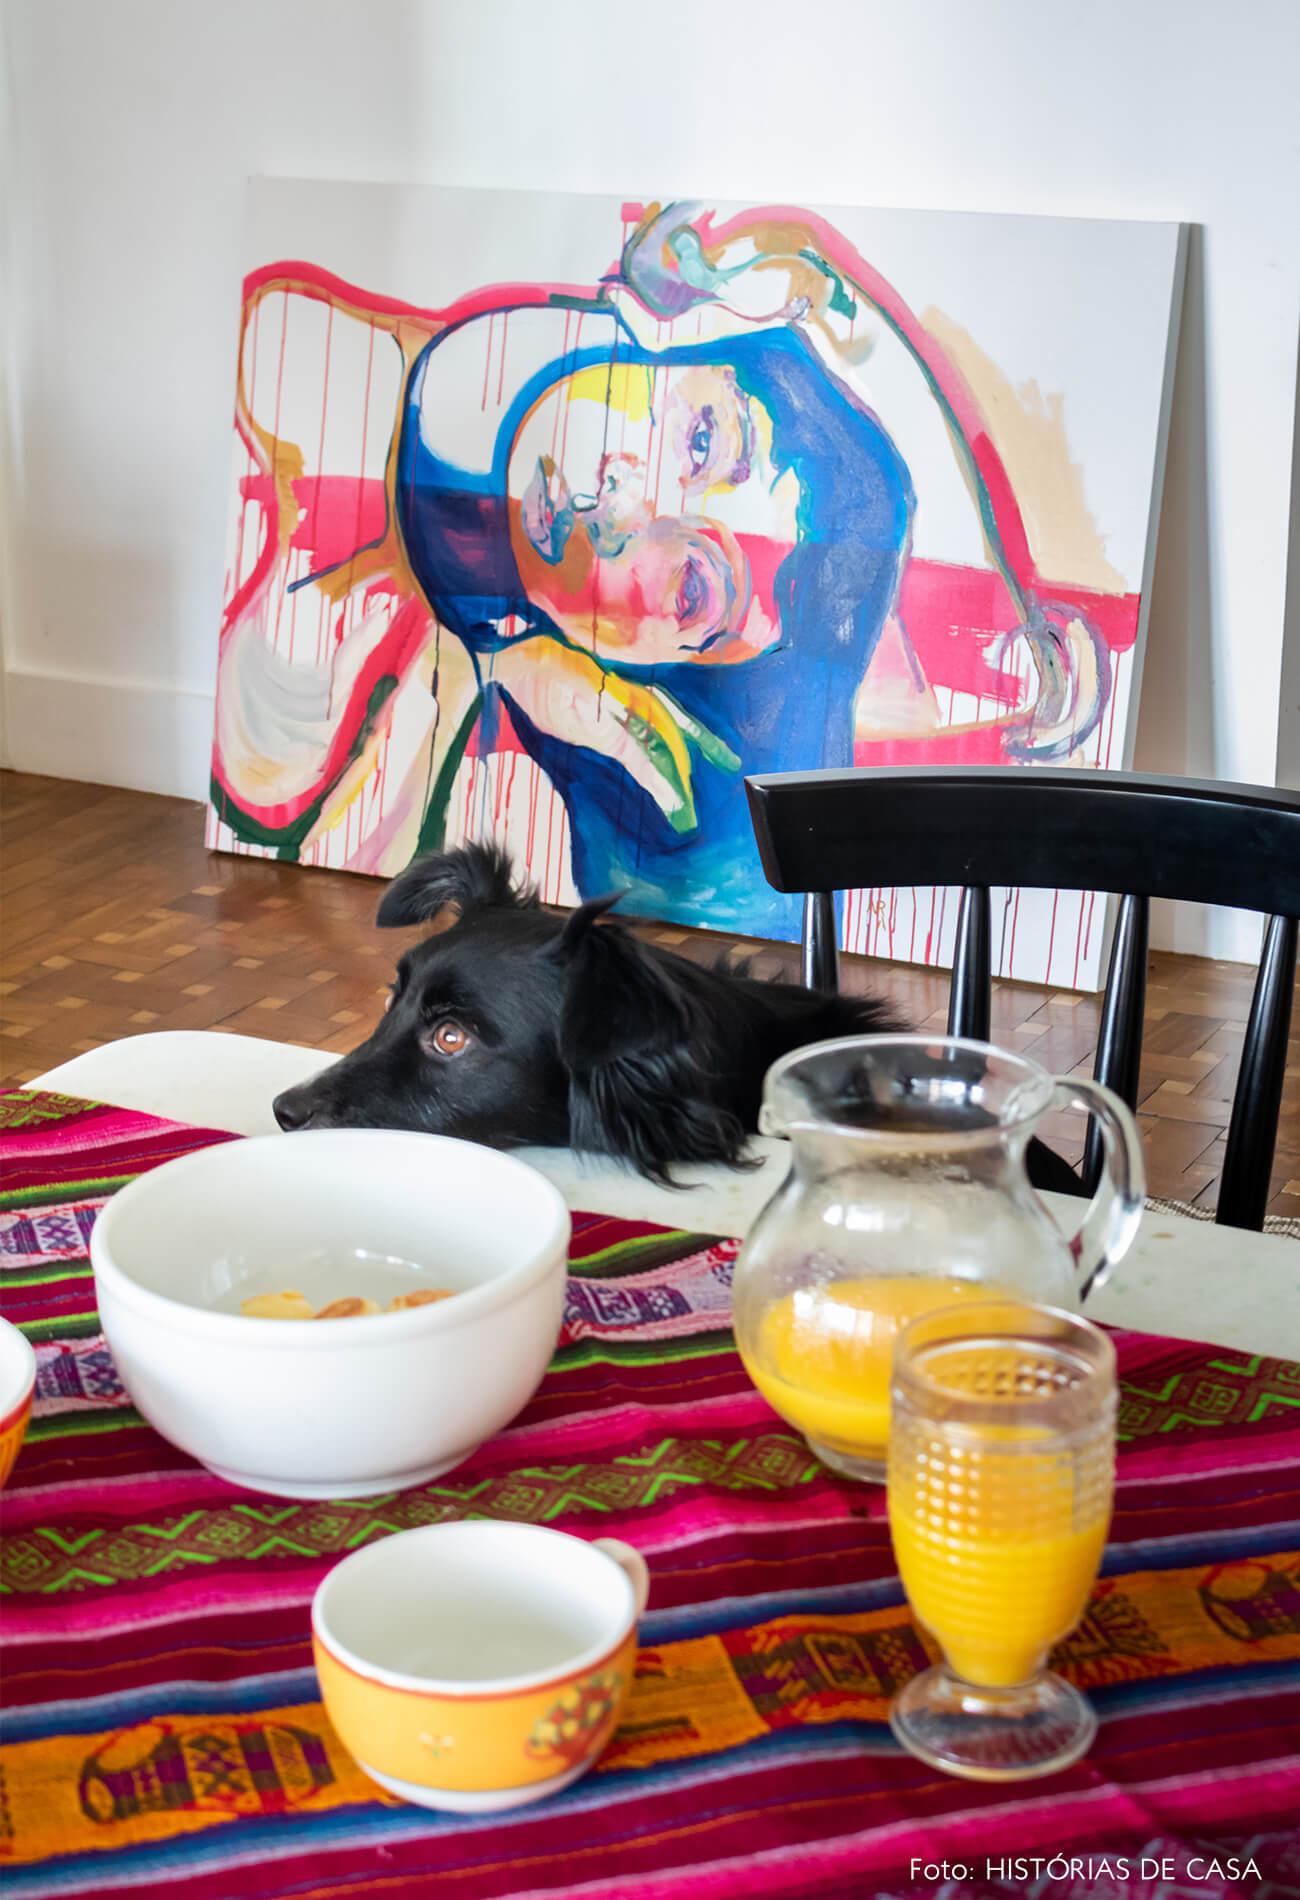 retrato-pet-cachorro-na-mesa-branca-com-toalha-estampada-rosa